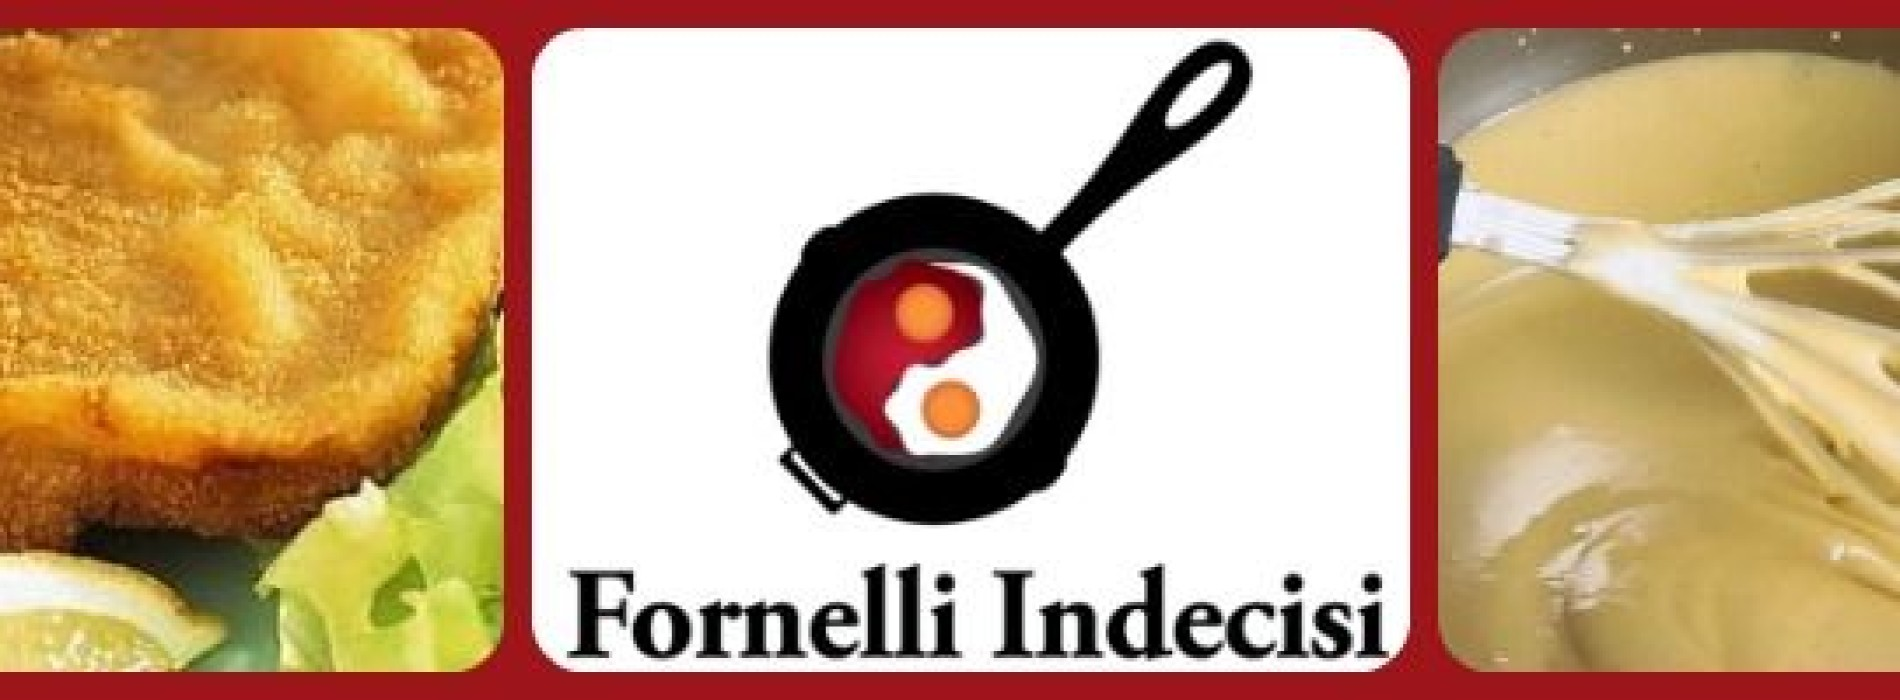 Fornelli indecisi la gara di cucina tradizionale - Fornelli cucina ...